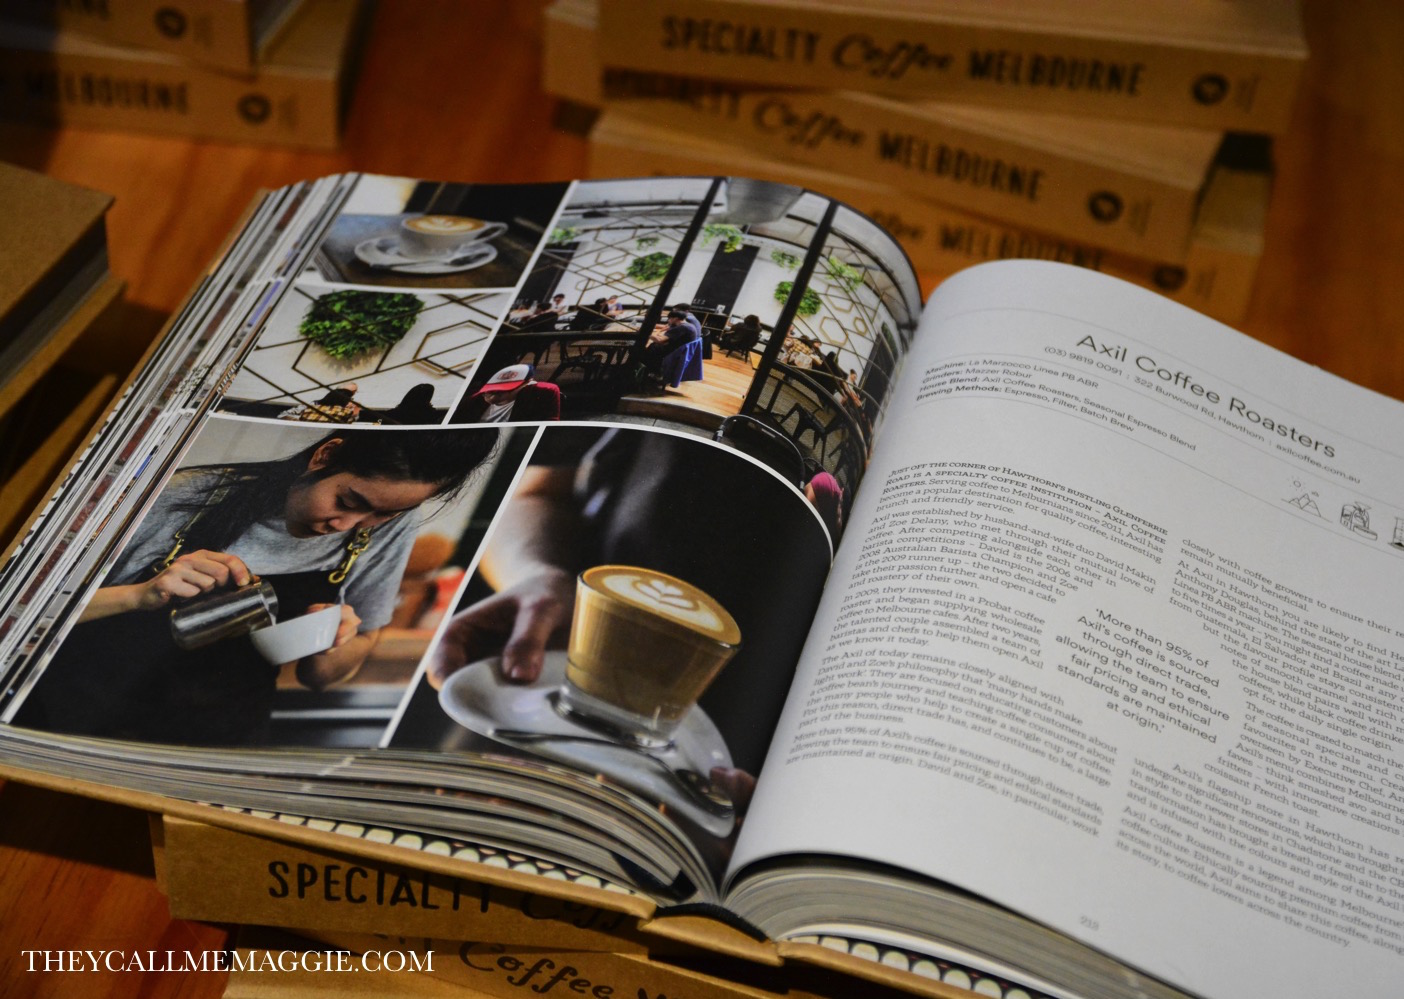 specialty-coffee-book.jpg